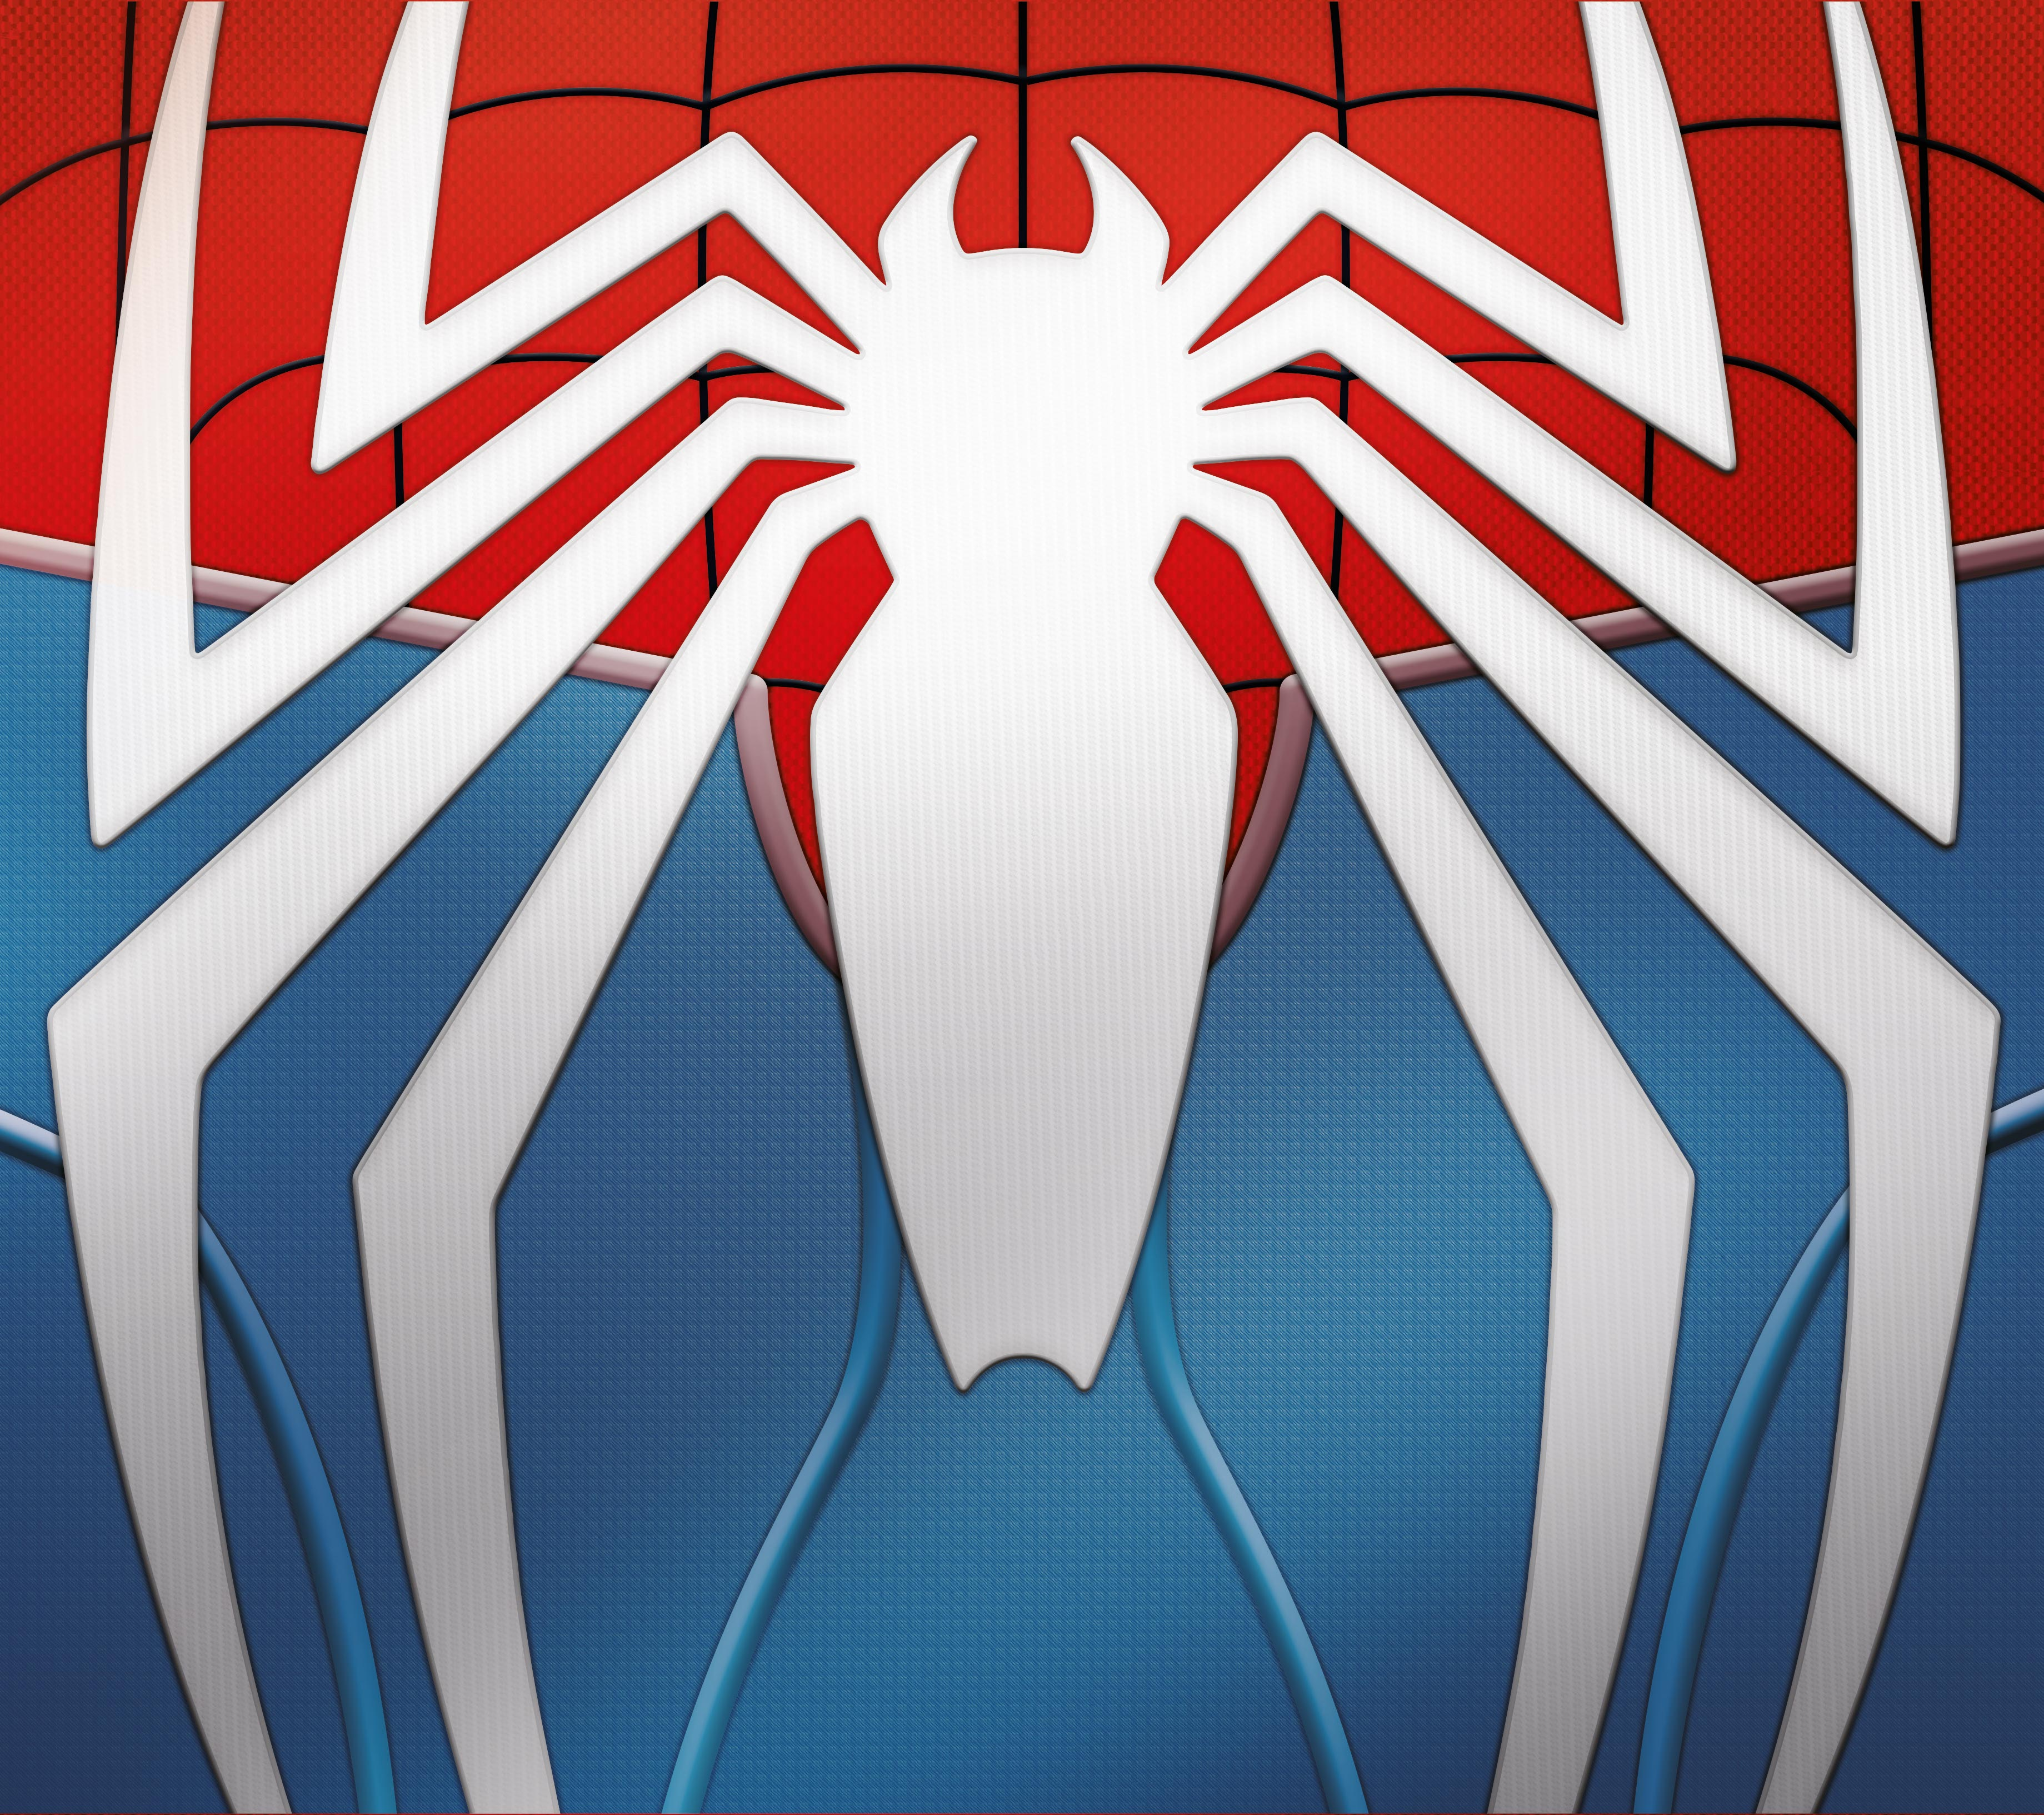 ps4 spiderman collectors edition uk